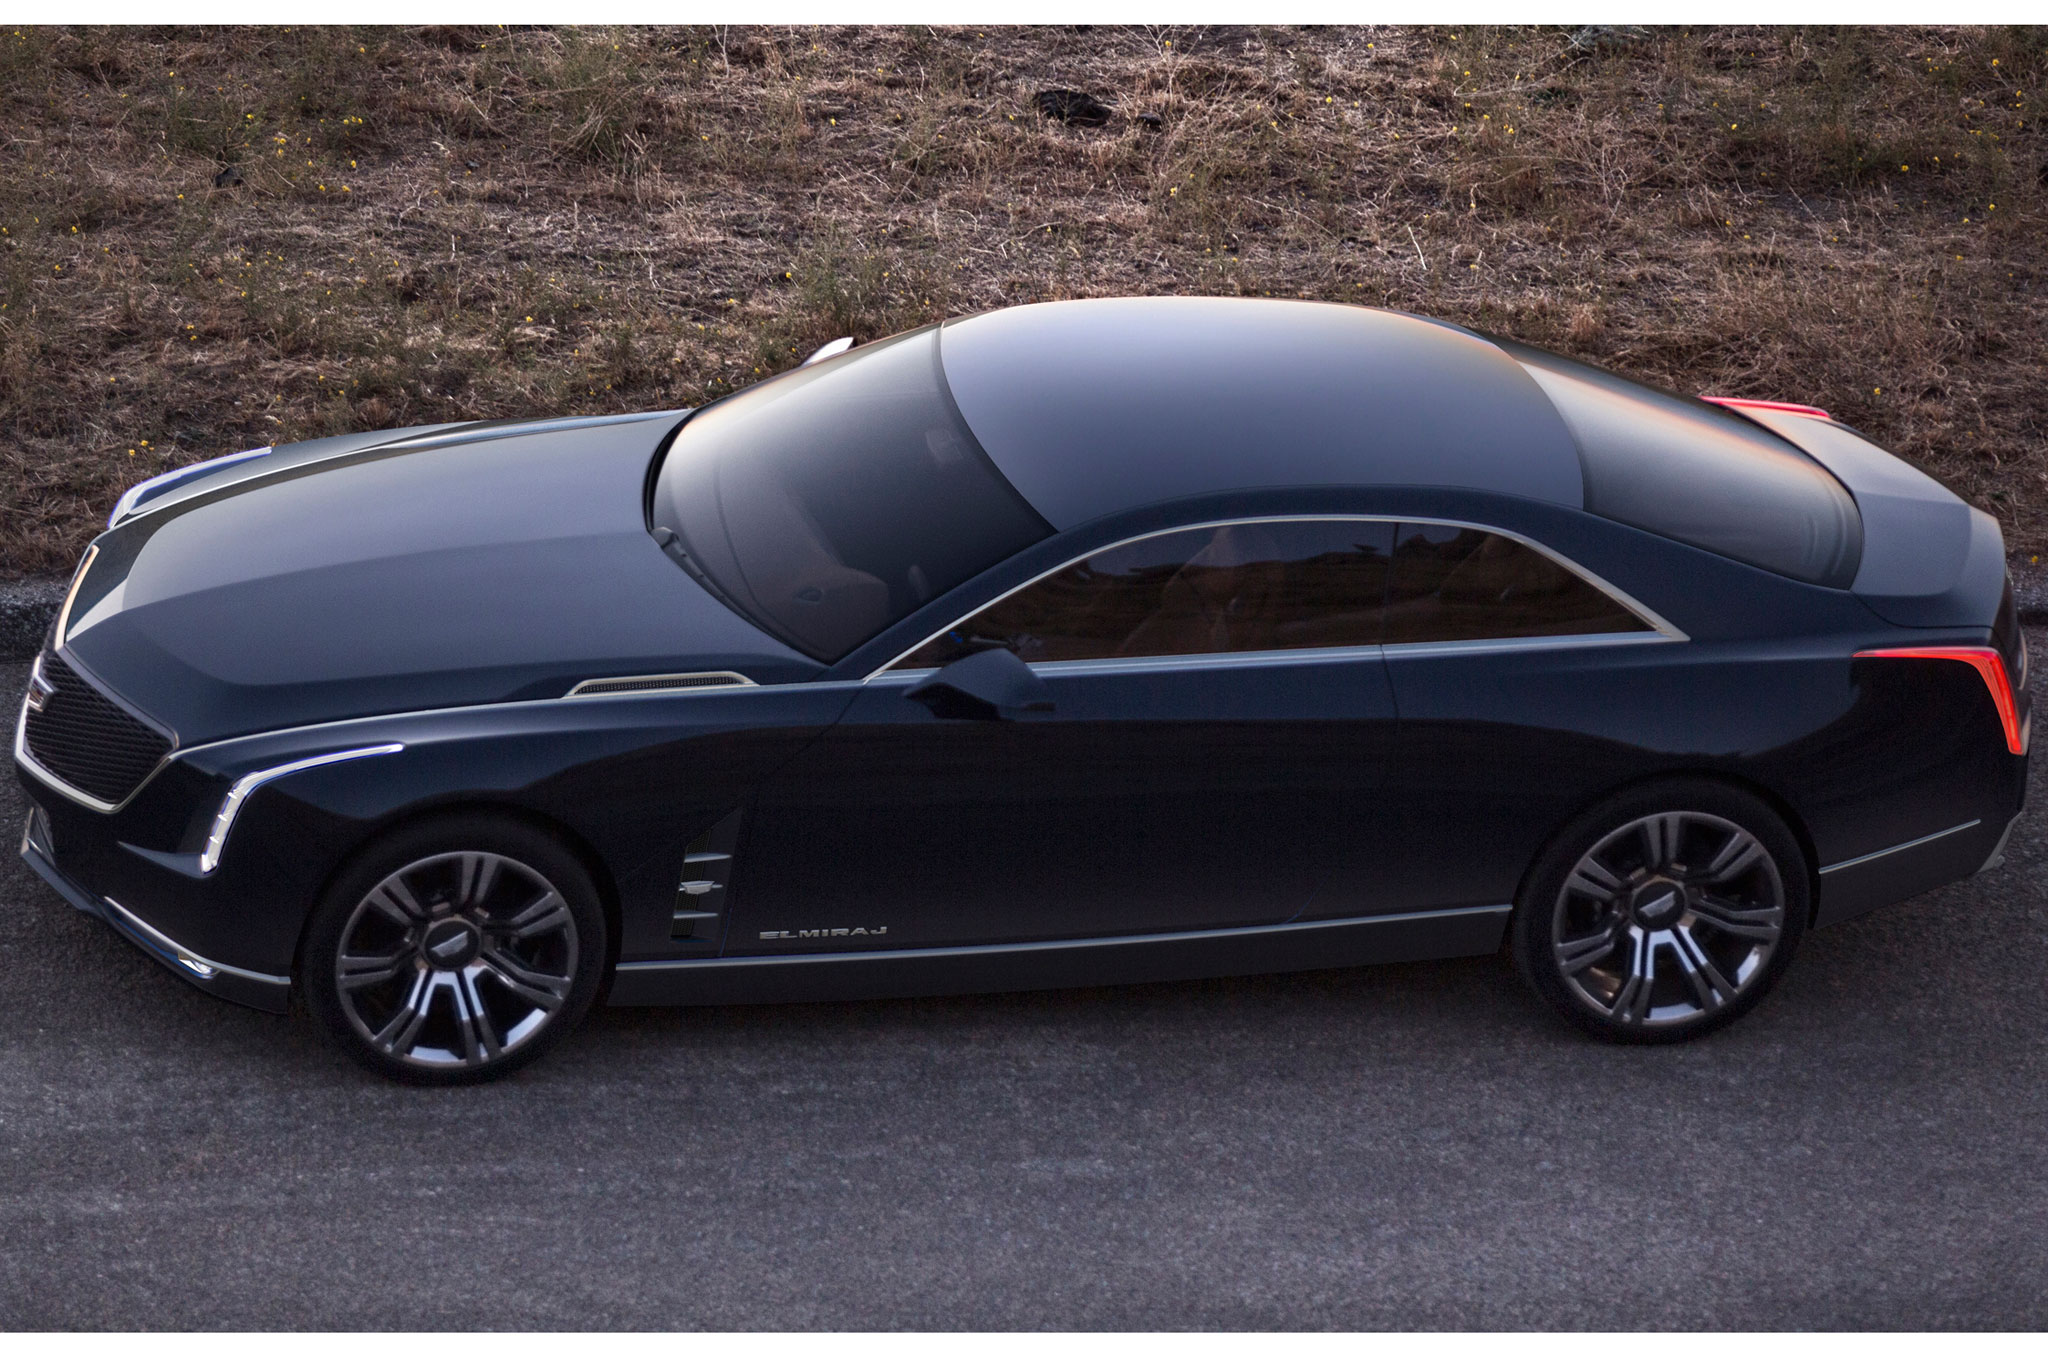 2013 Cadillac Elmiraj Concept Revealed at Pebble Beach - Automobile